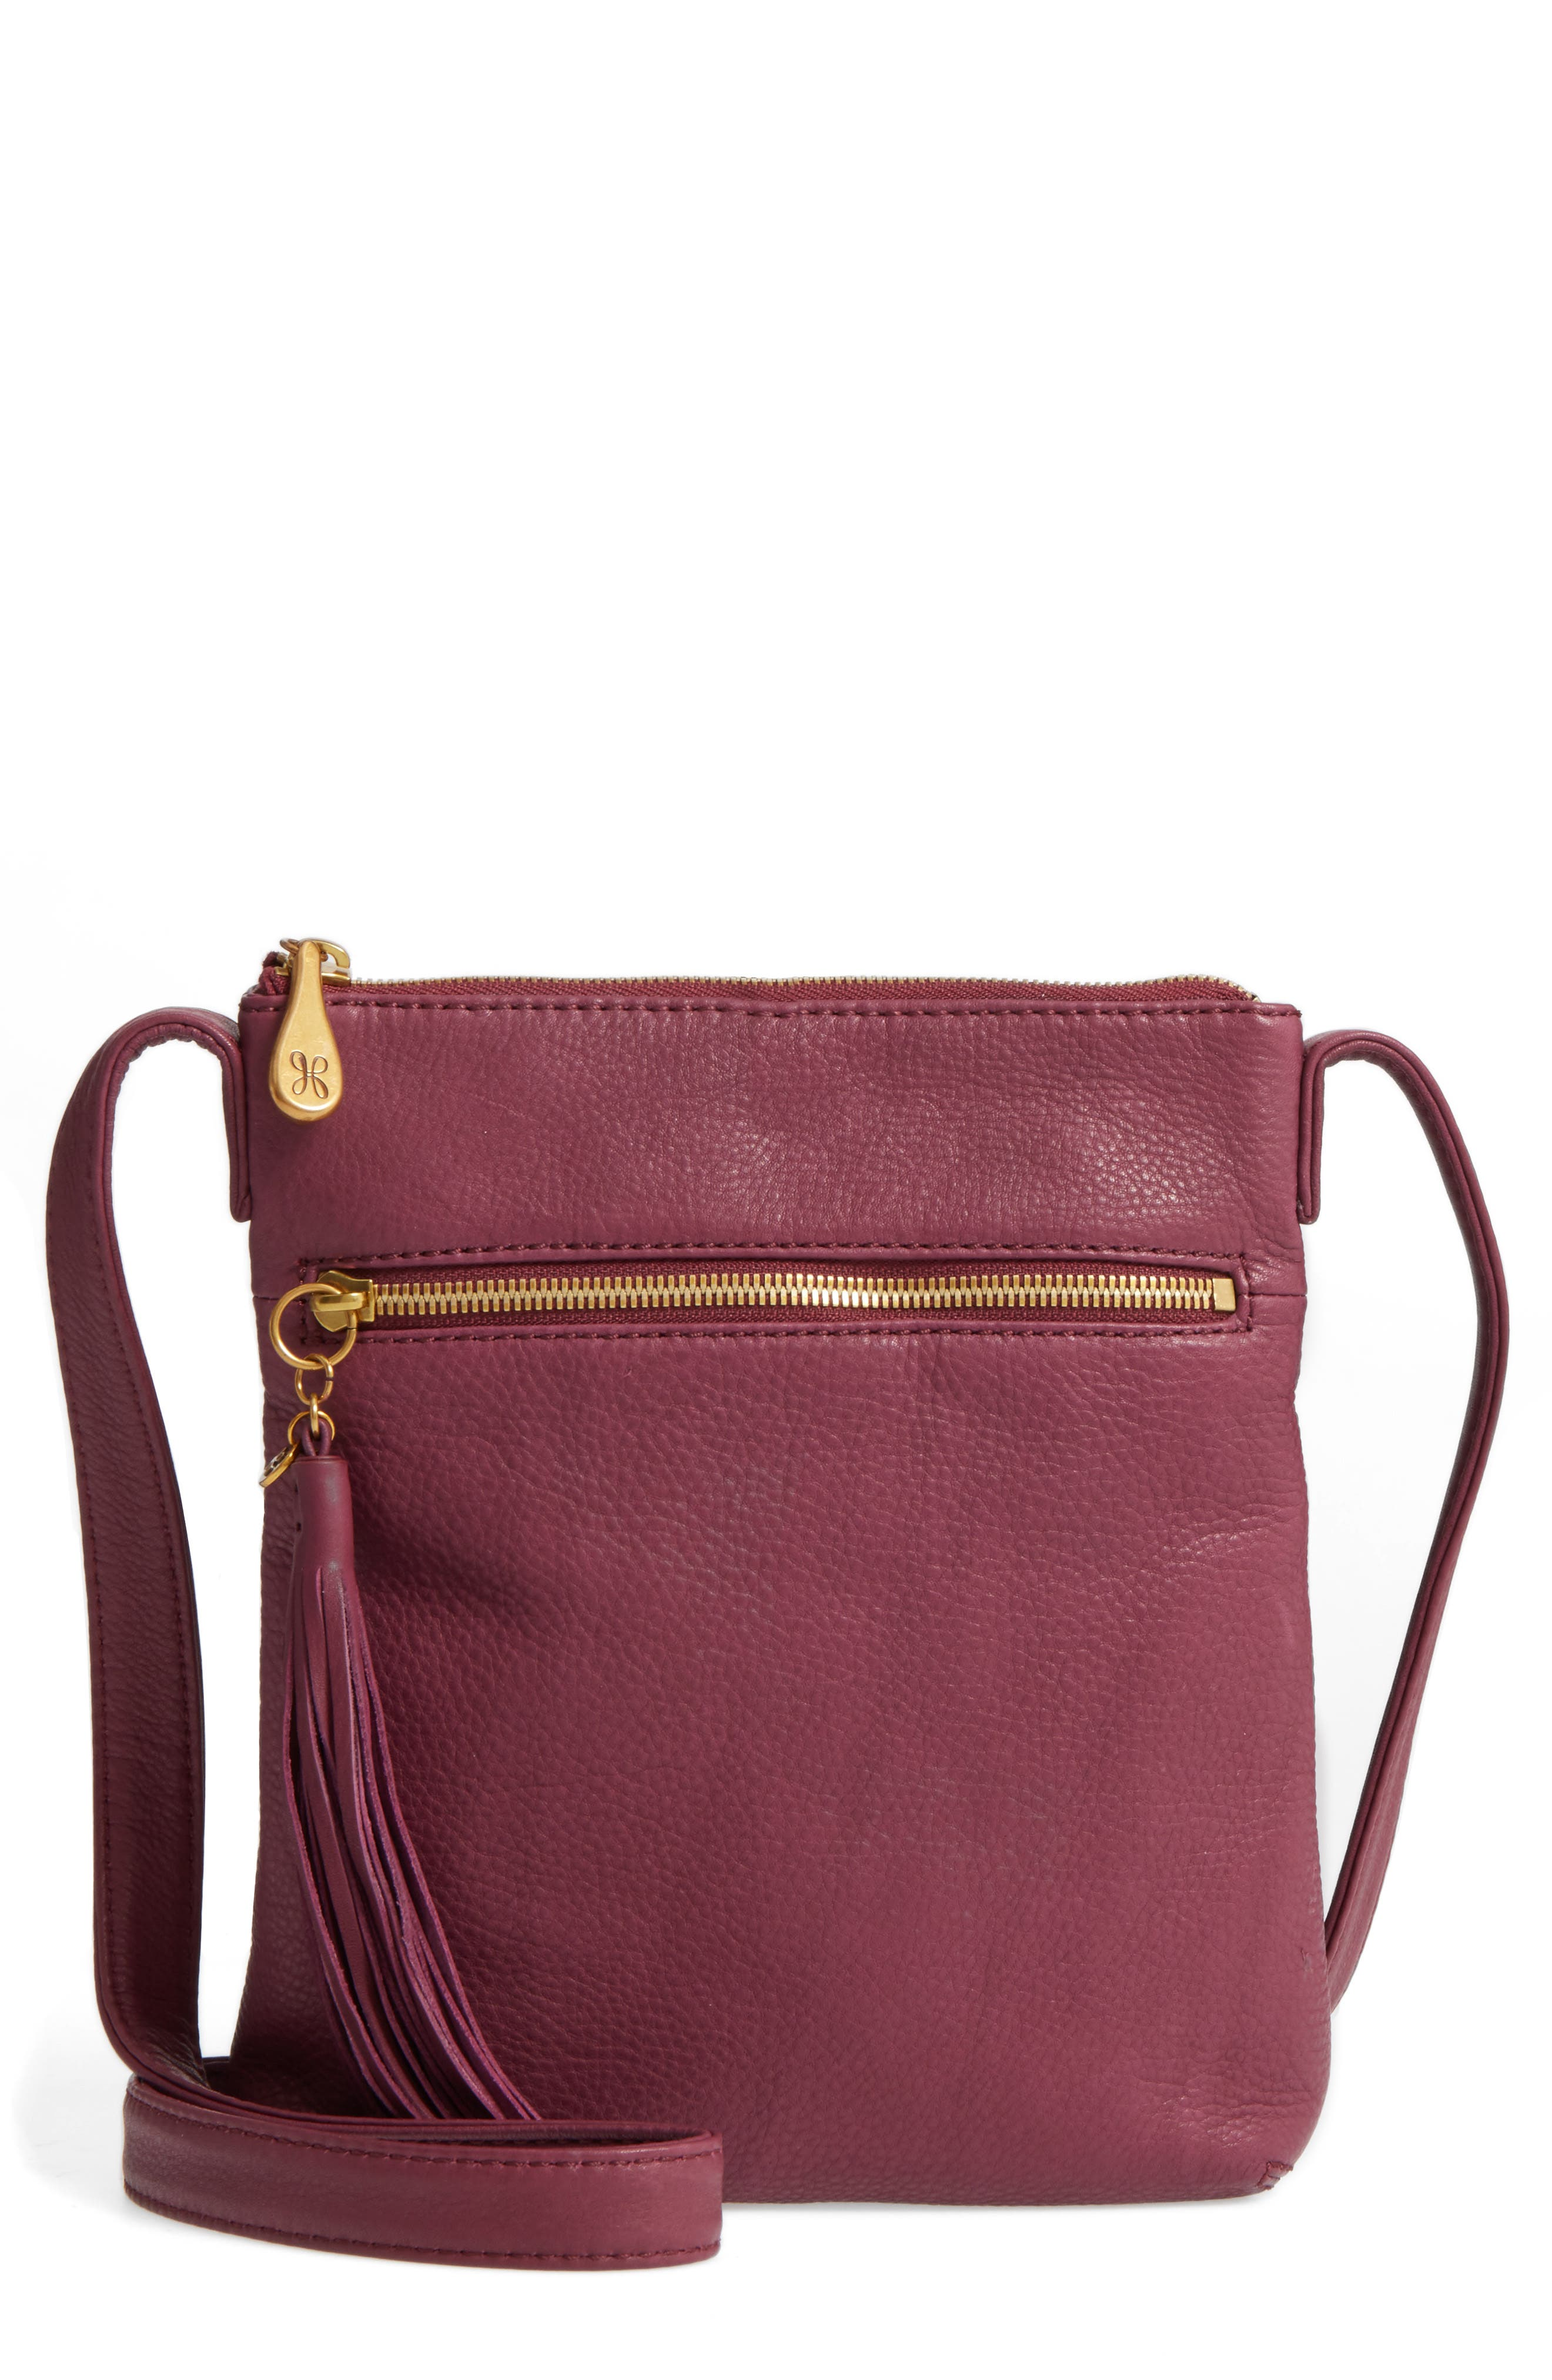 Main Image - Hobo 'Sarah' Leather Crossbody Bag